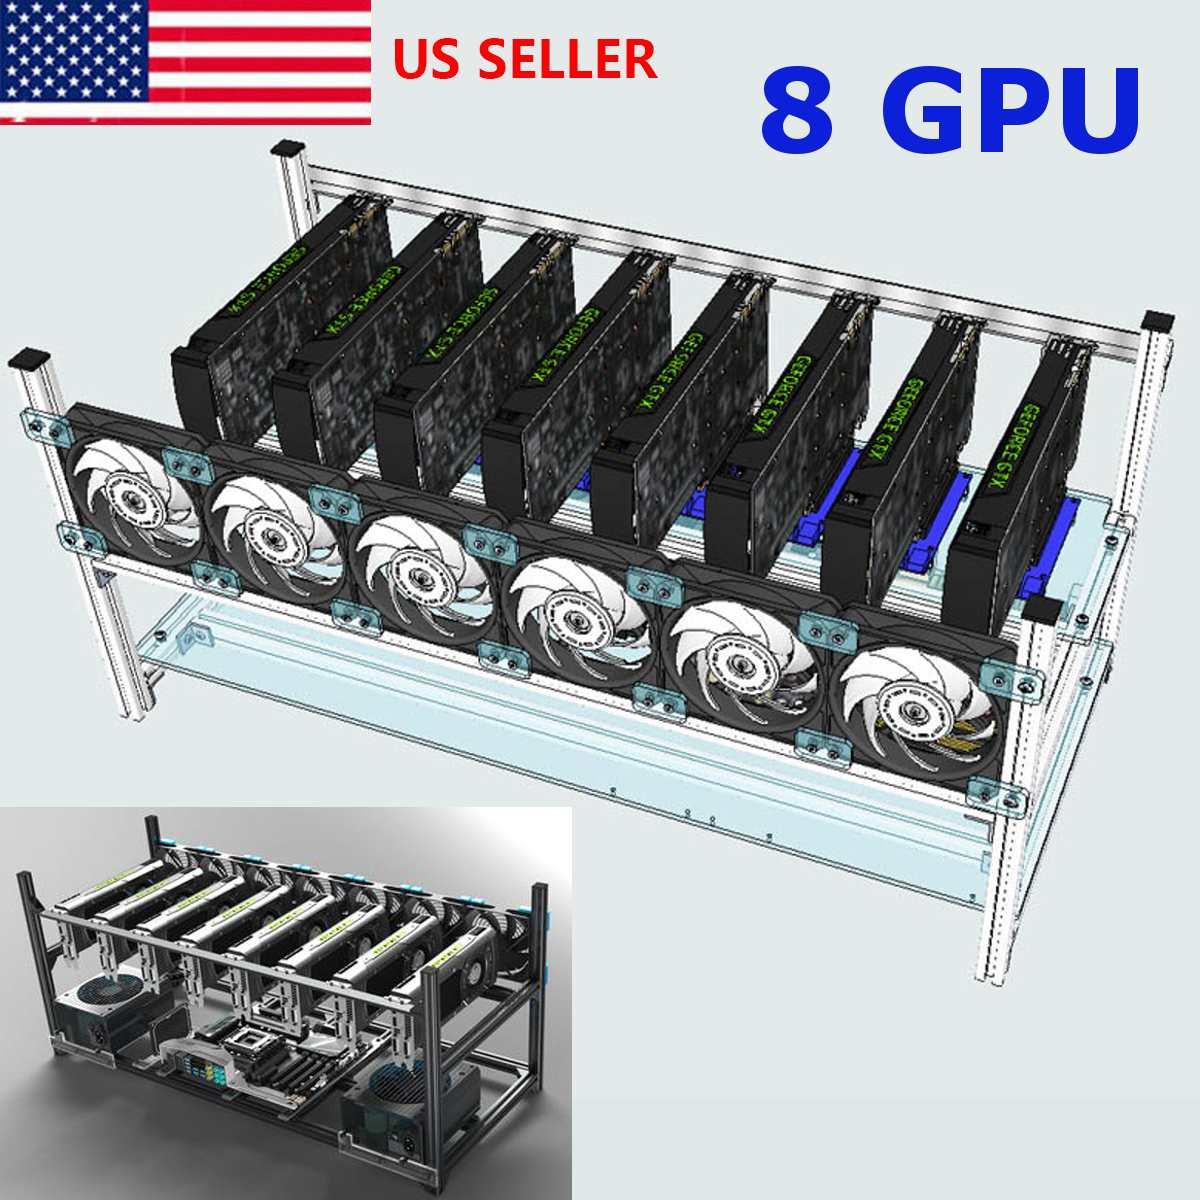 New 8 GPU Open Air Miner Mining Frame Case Mining Coin Ring Support Bracket Case Holder Rack For FRAME